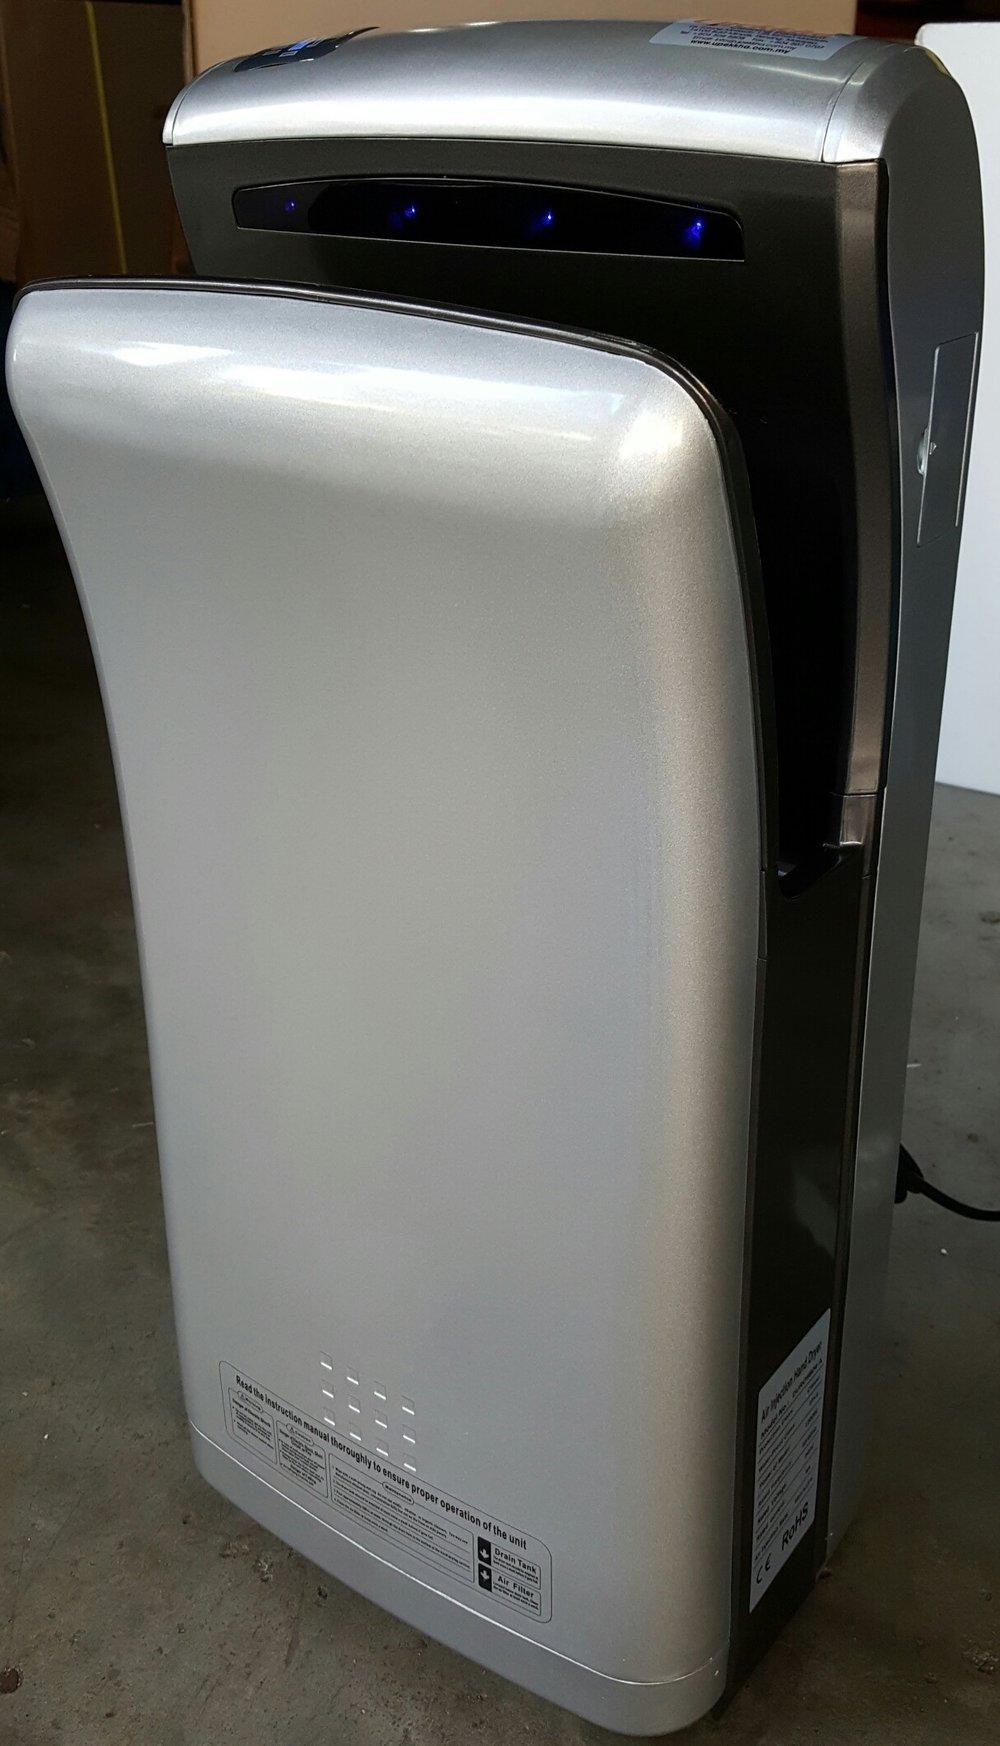 V-X04 Super High Speed Ultra Dry Pro - Jet Hand Dryer